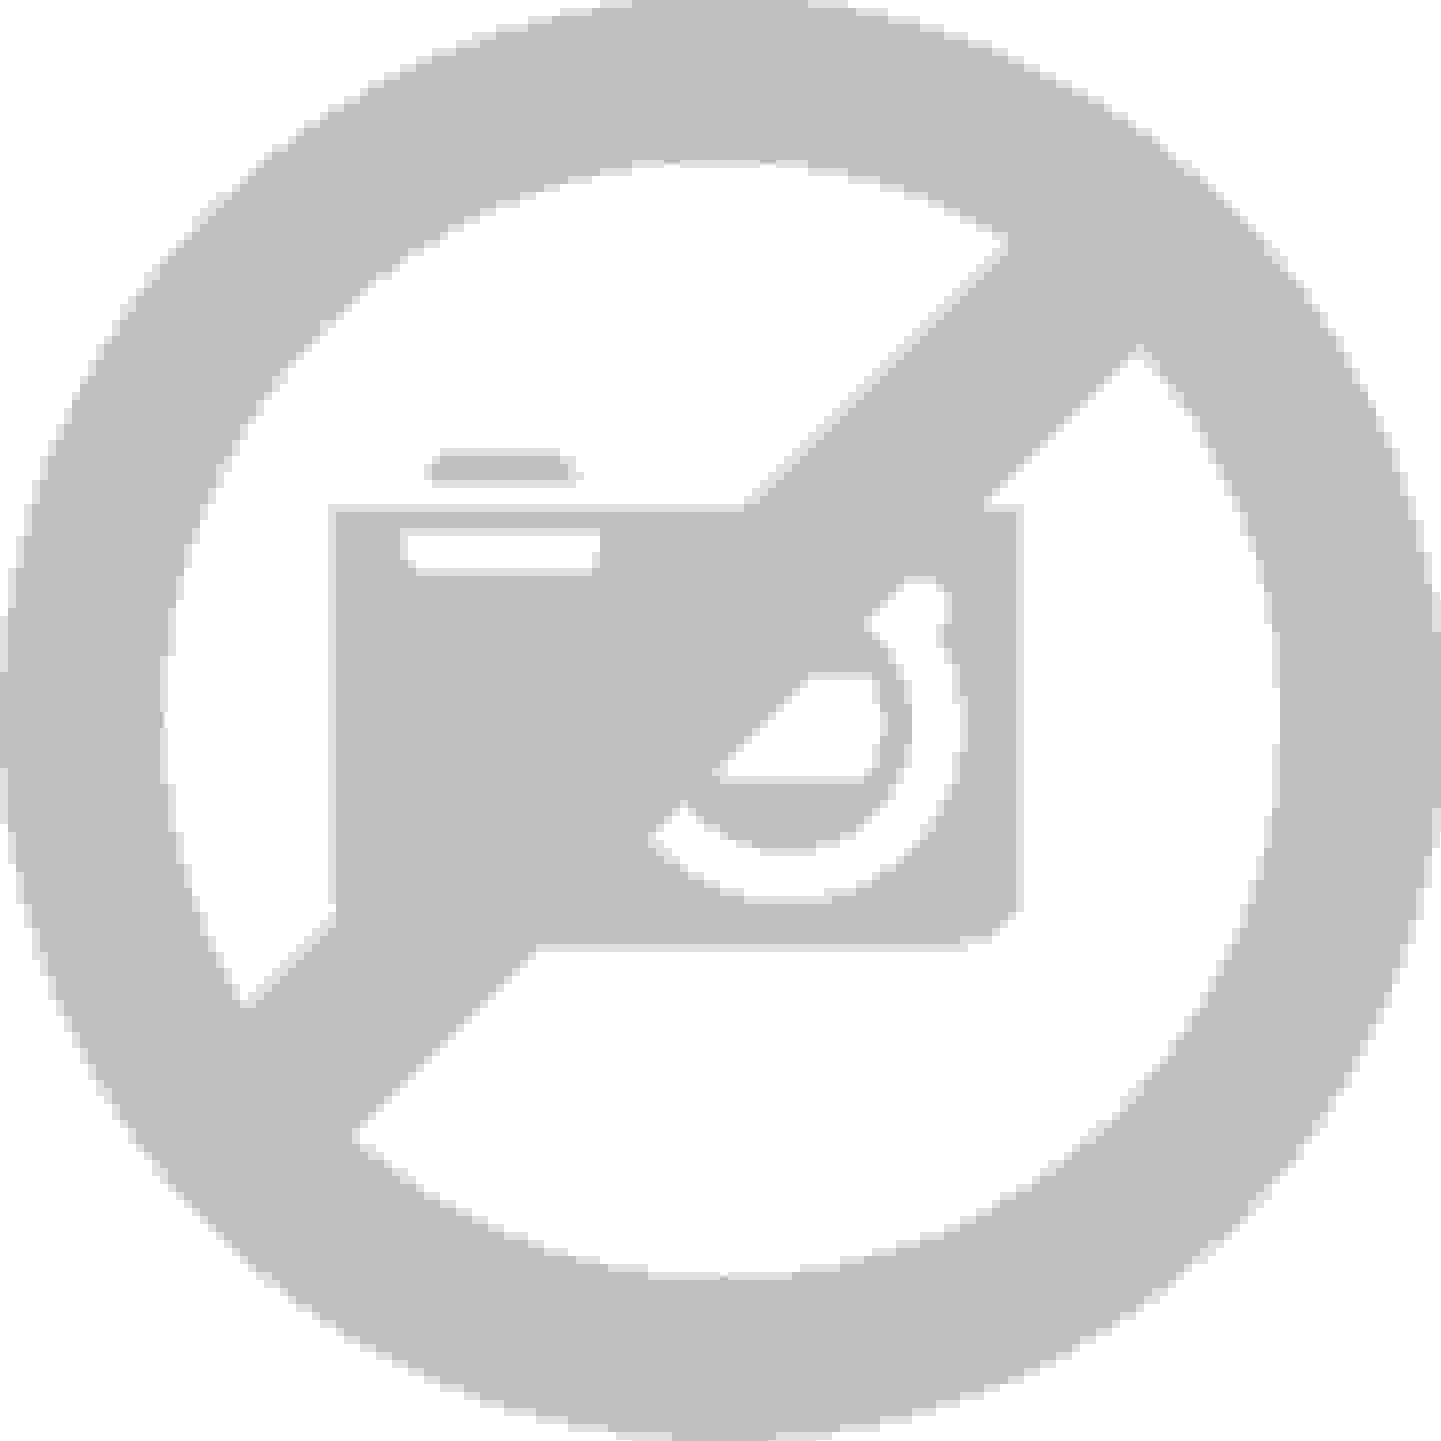 Epson EcoTank ET-2710 Tintenstrahl-Multifunktionsdrucker